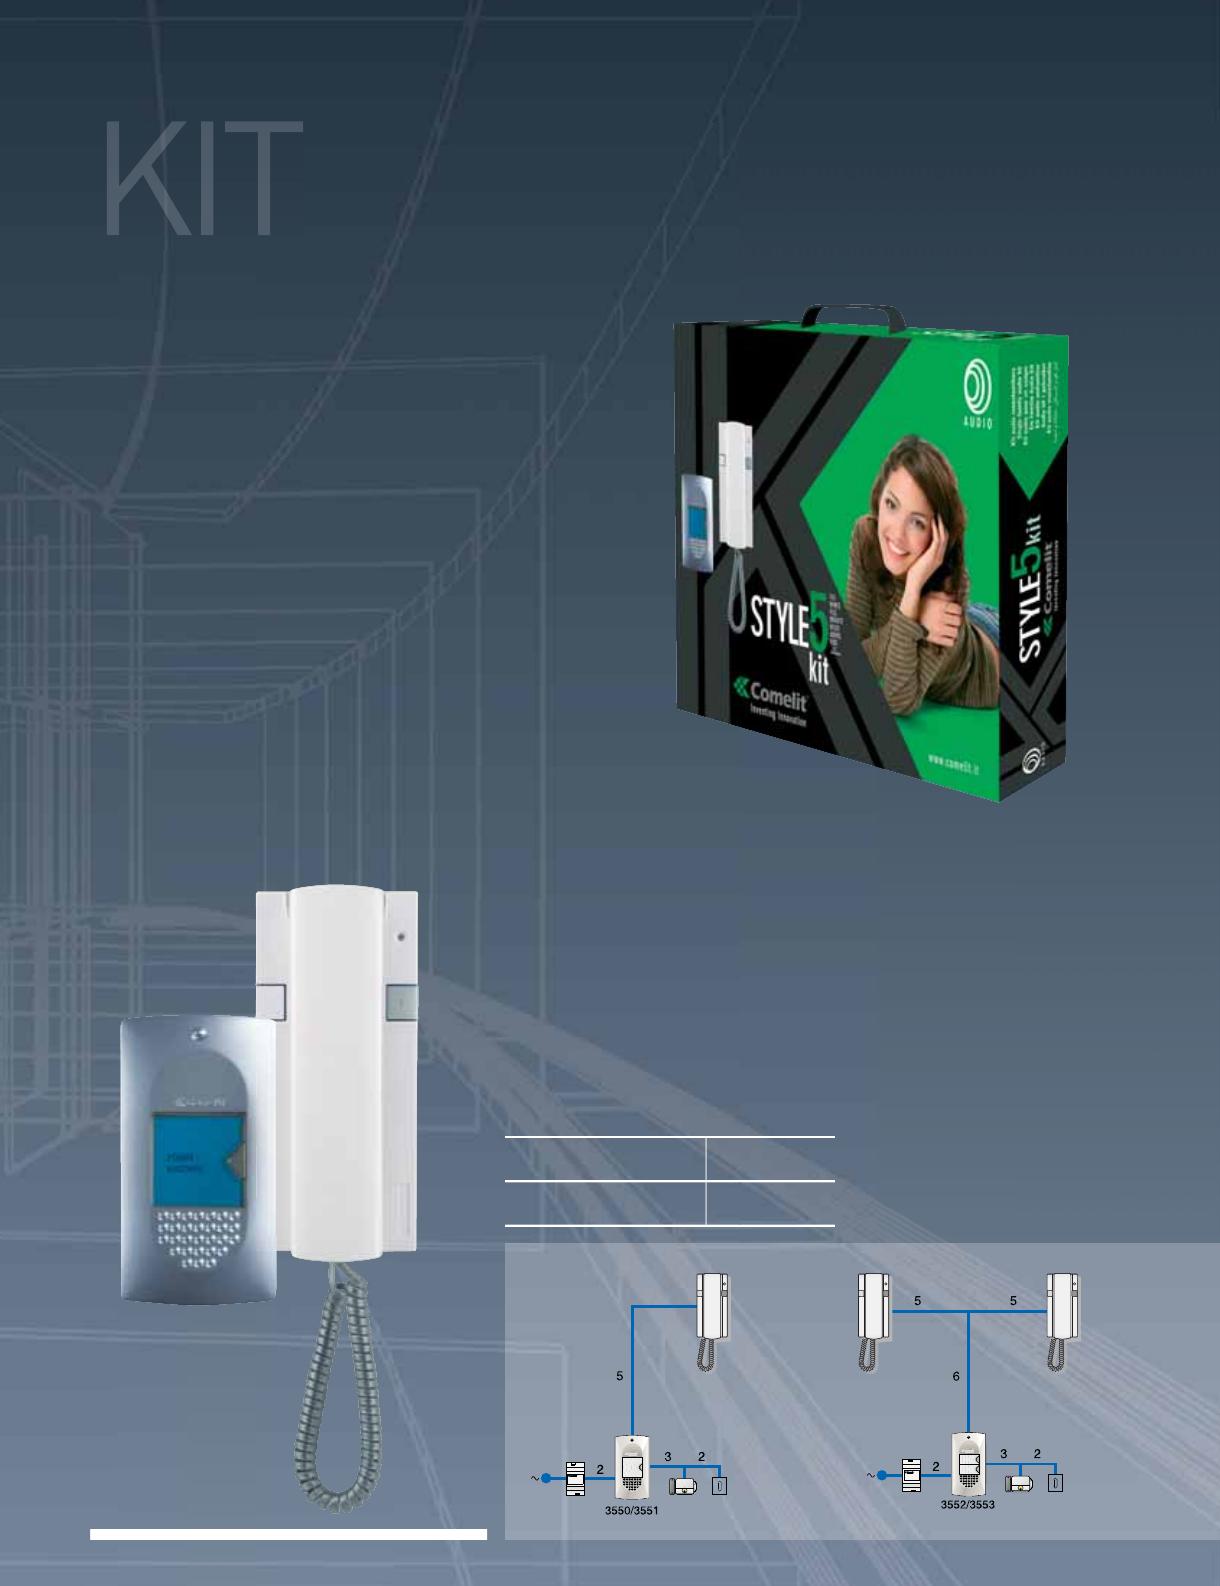 /12/VAC//60VA 4DIN /Transformateur 230/V//0/ COMELIT/